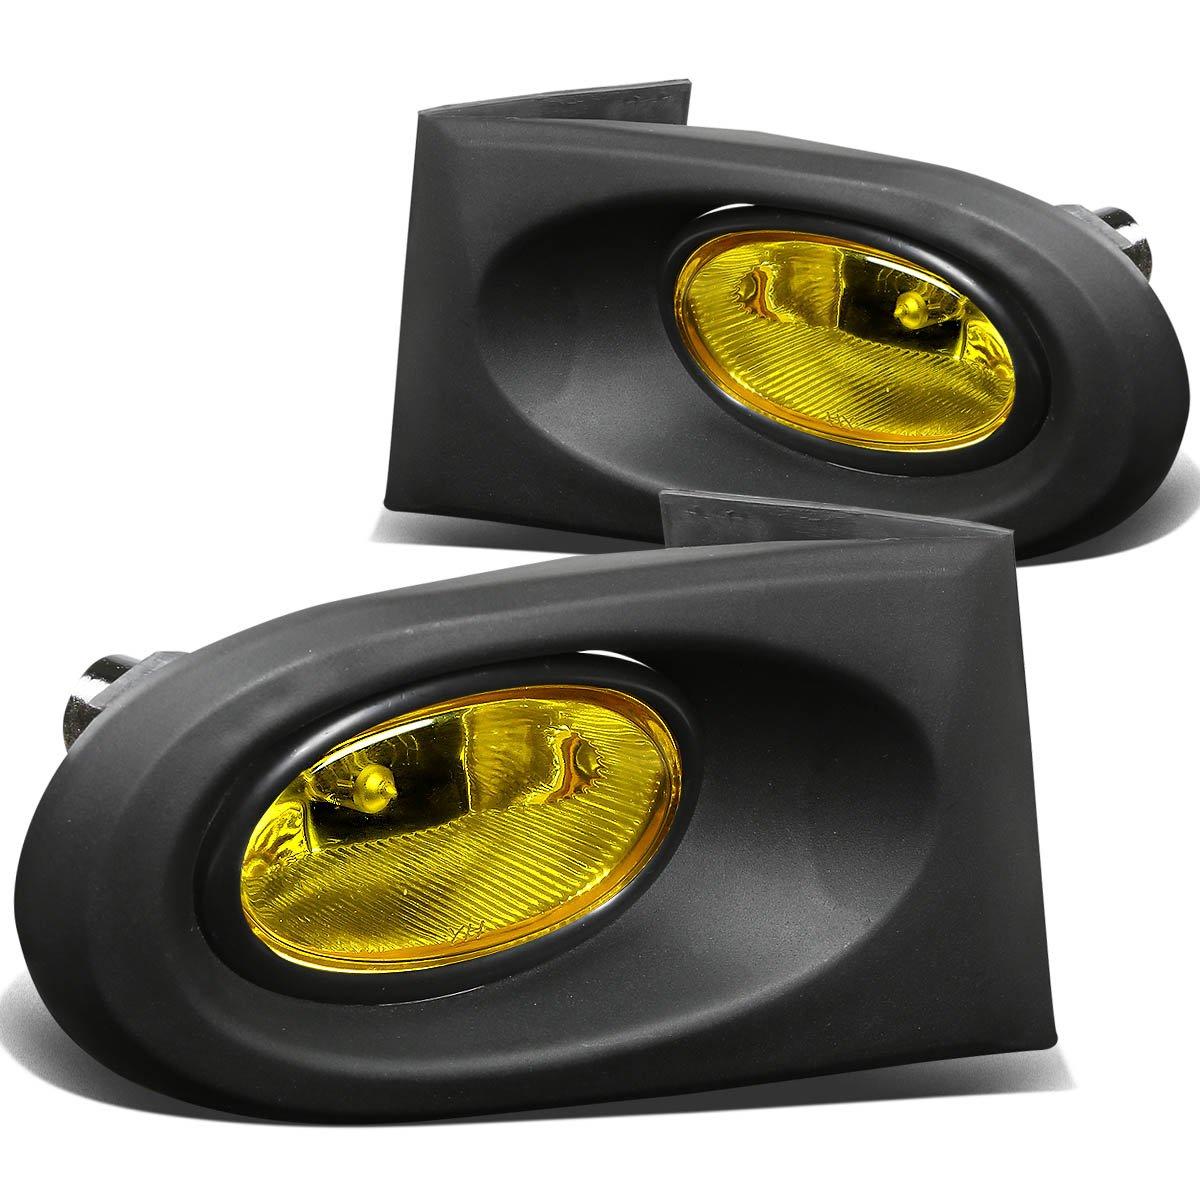 Amazon.com: For Acura RSX Driving Bumper Fog Light+Bulbs+Switch (Amber  Lens) - DC5 K20: Automotive